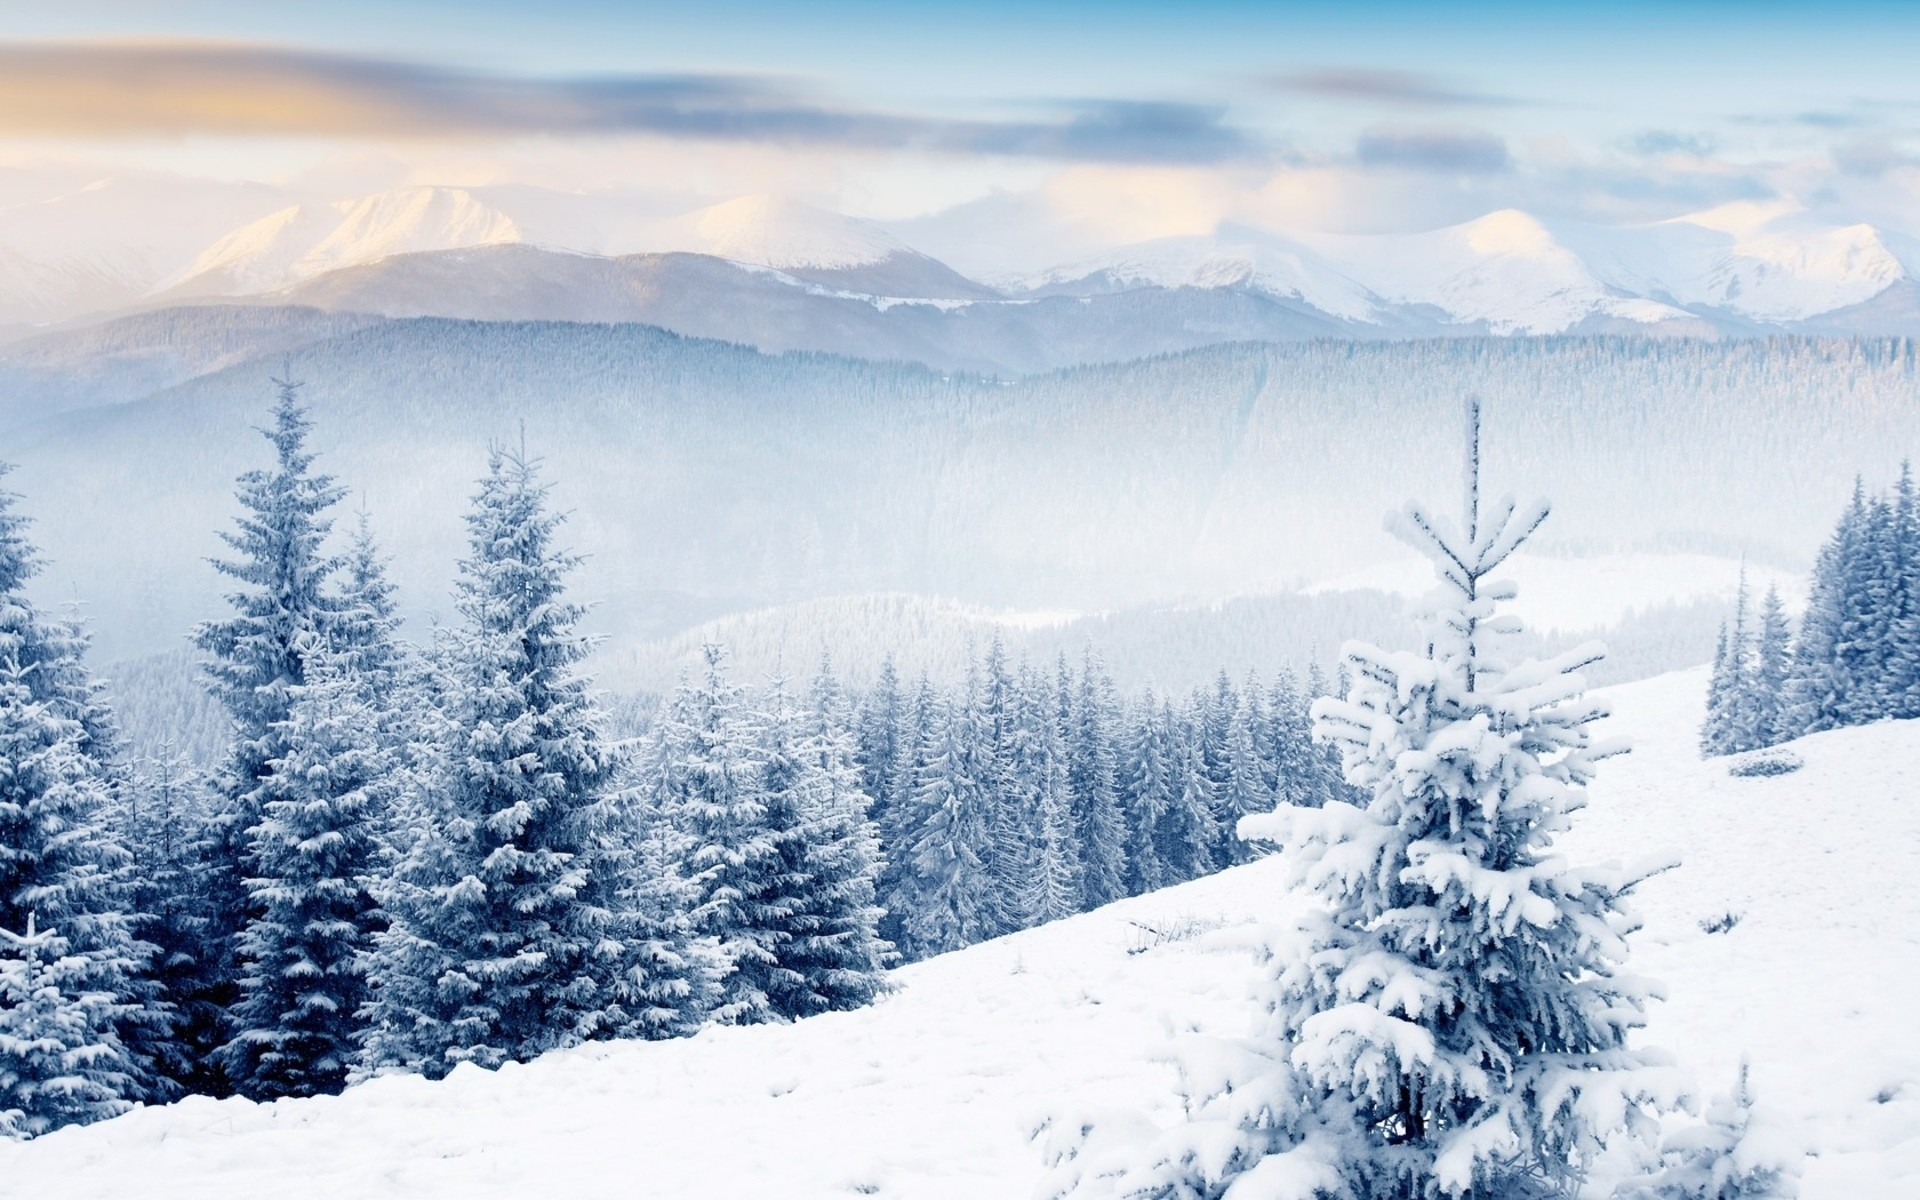 panorama 1 panoramic 1 scenery 1 scenic 1 snow 1 vista 1 winter .